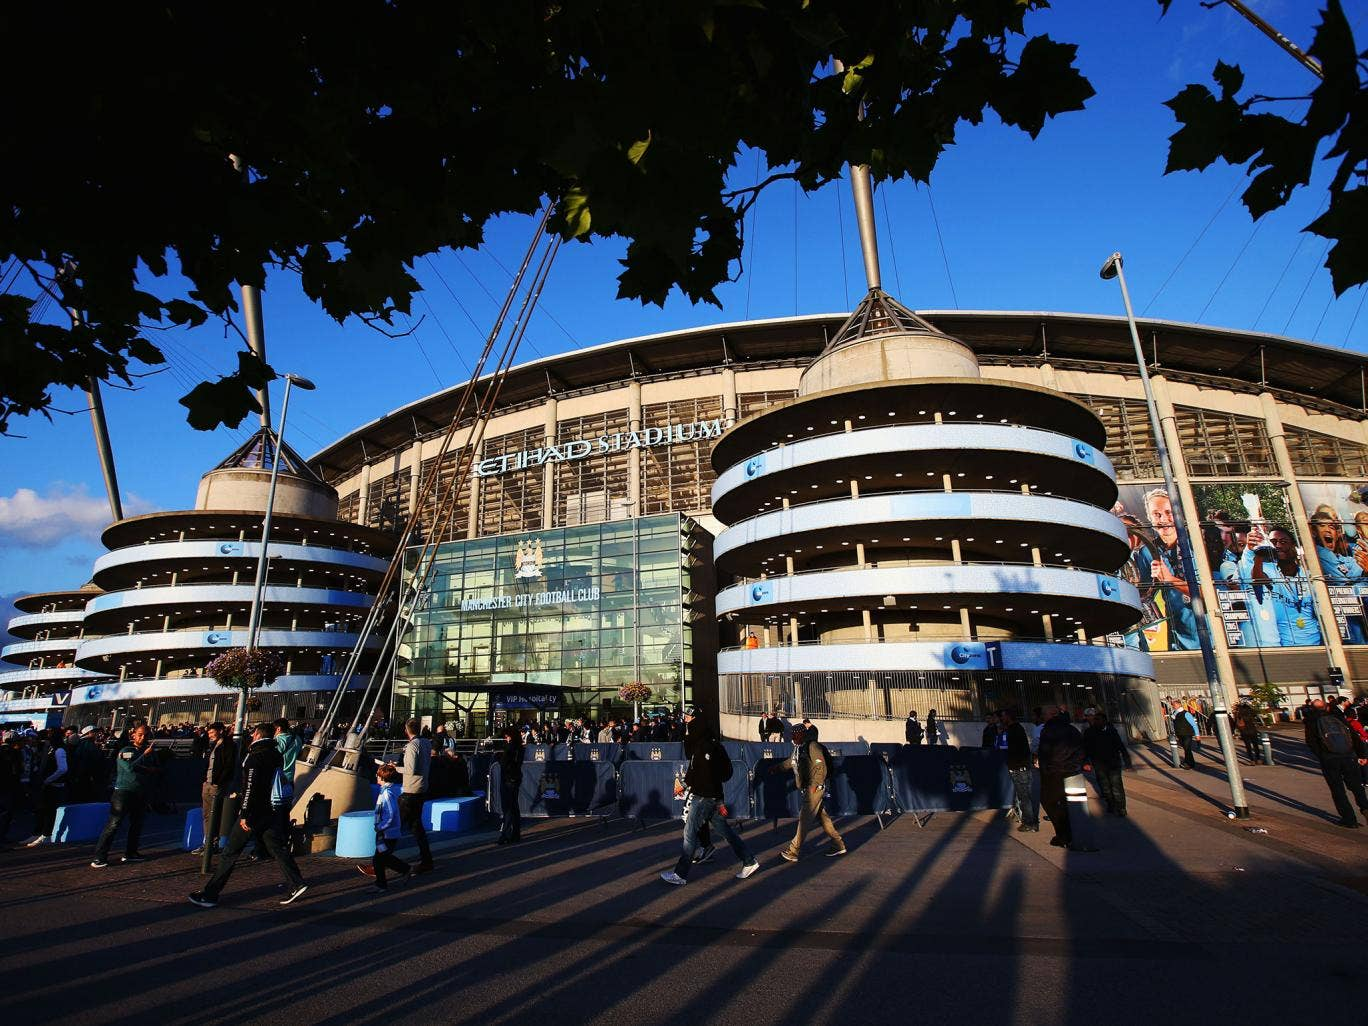 A view of Manchester City's Etihad Stadium